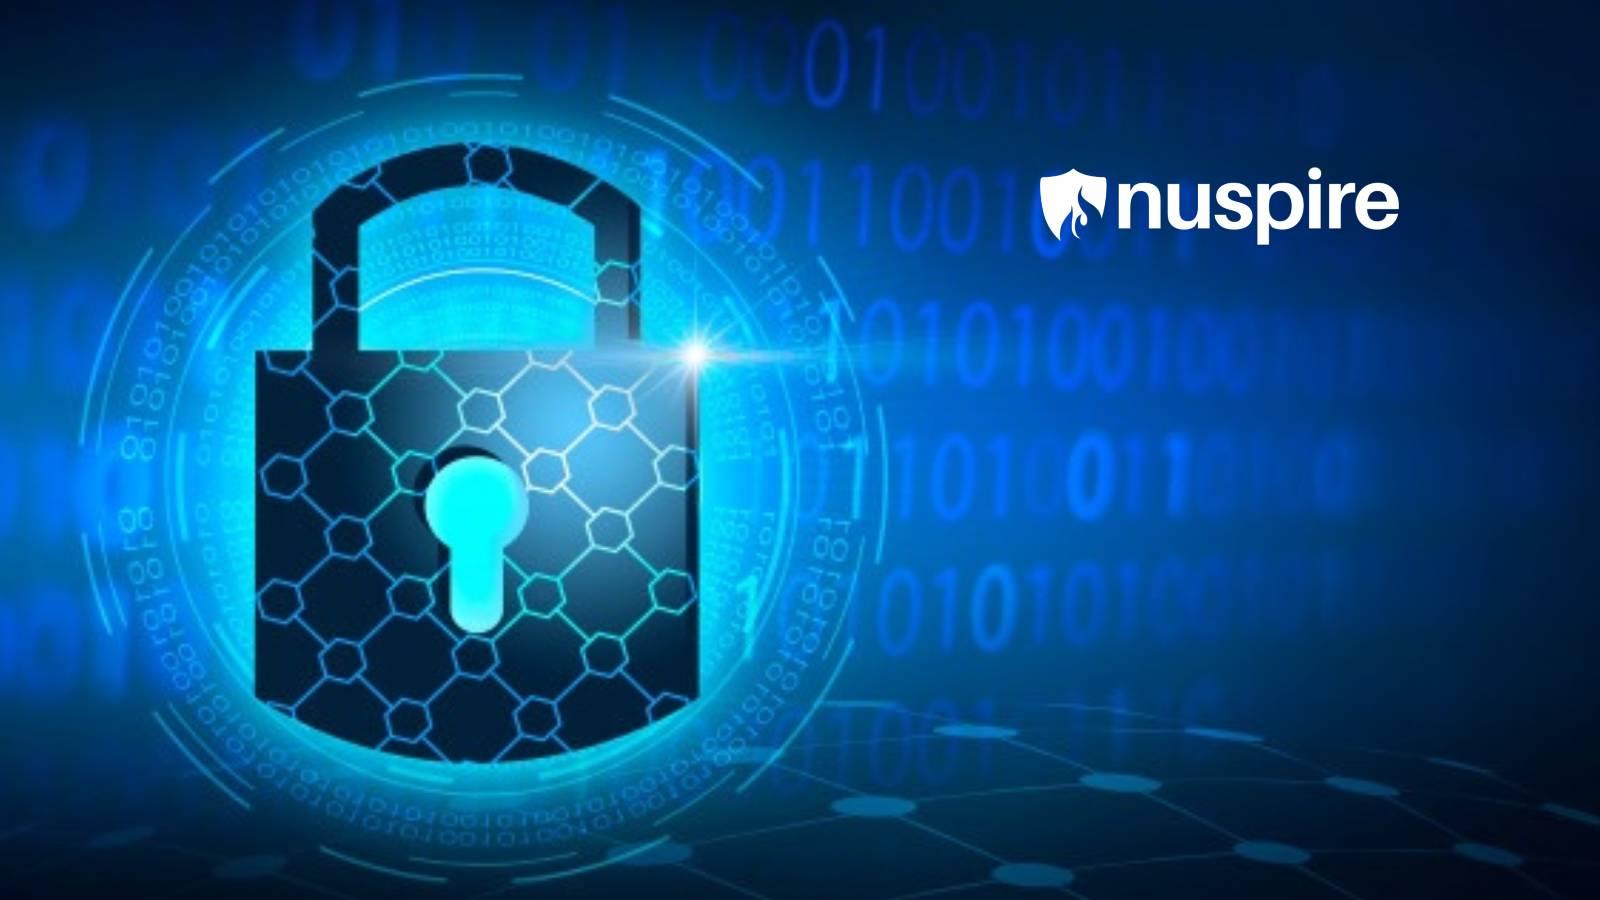 MSSP Nuspire lancia HALO per Network Security e Incident Response